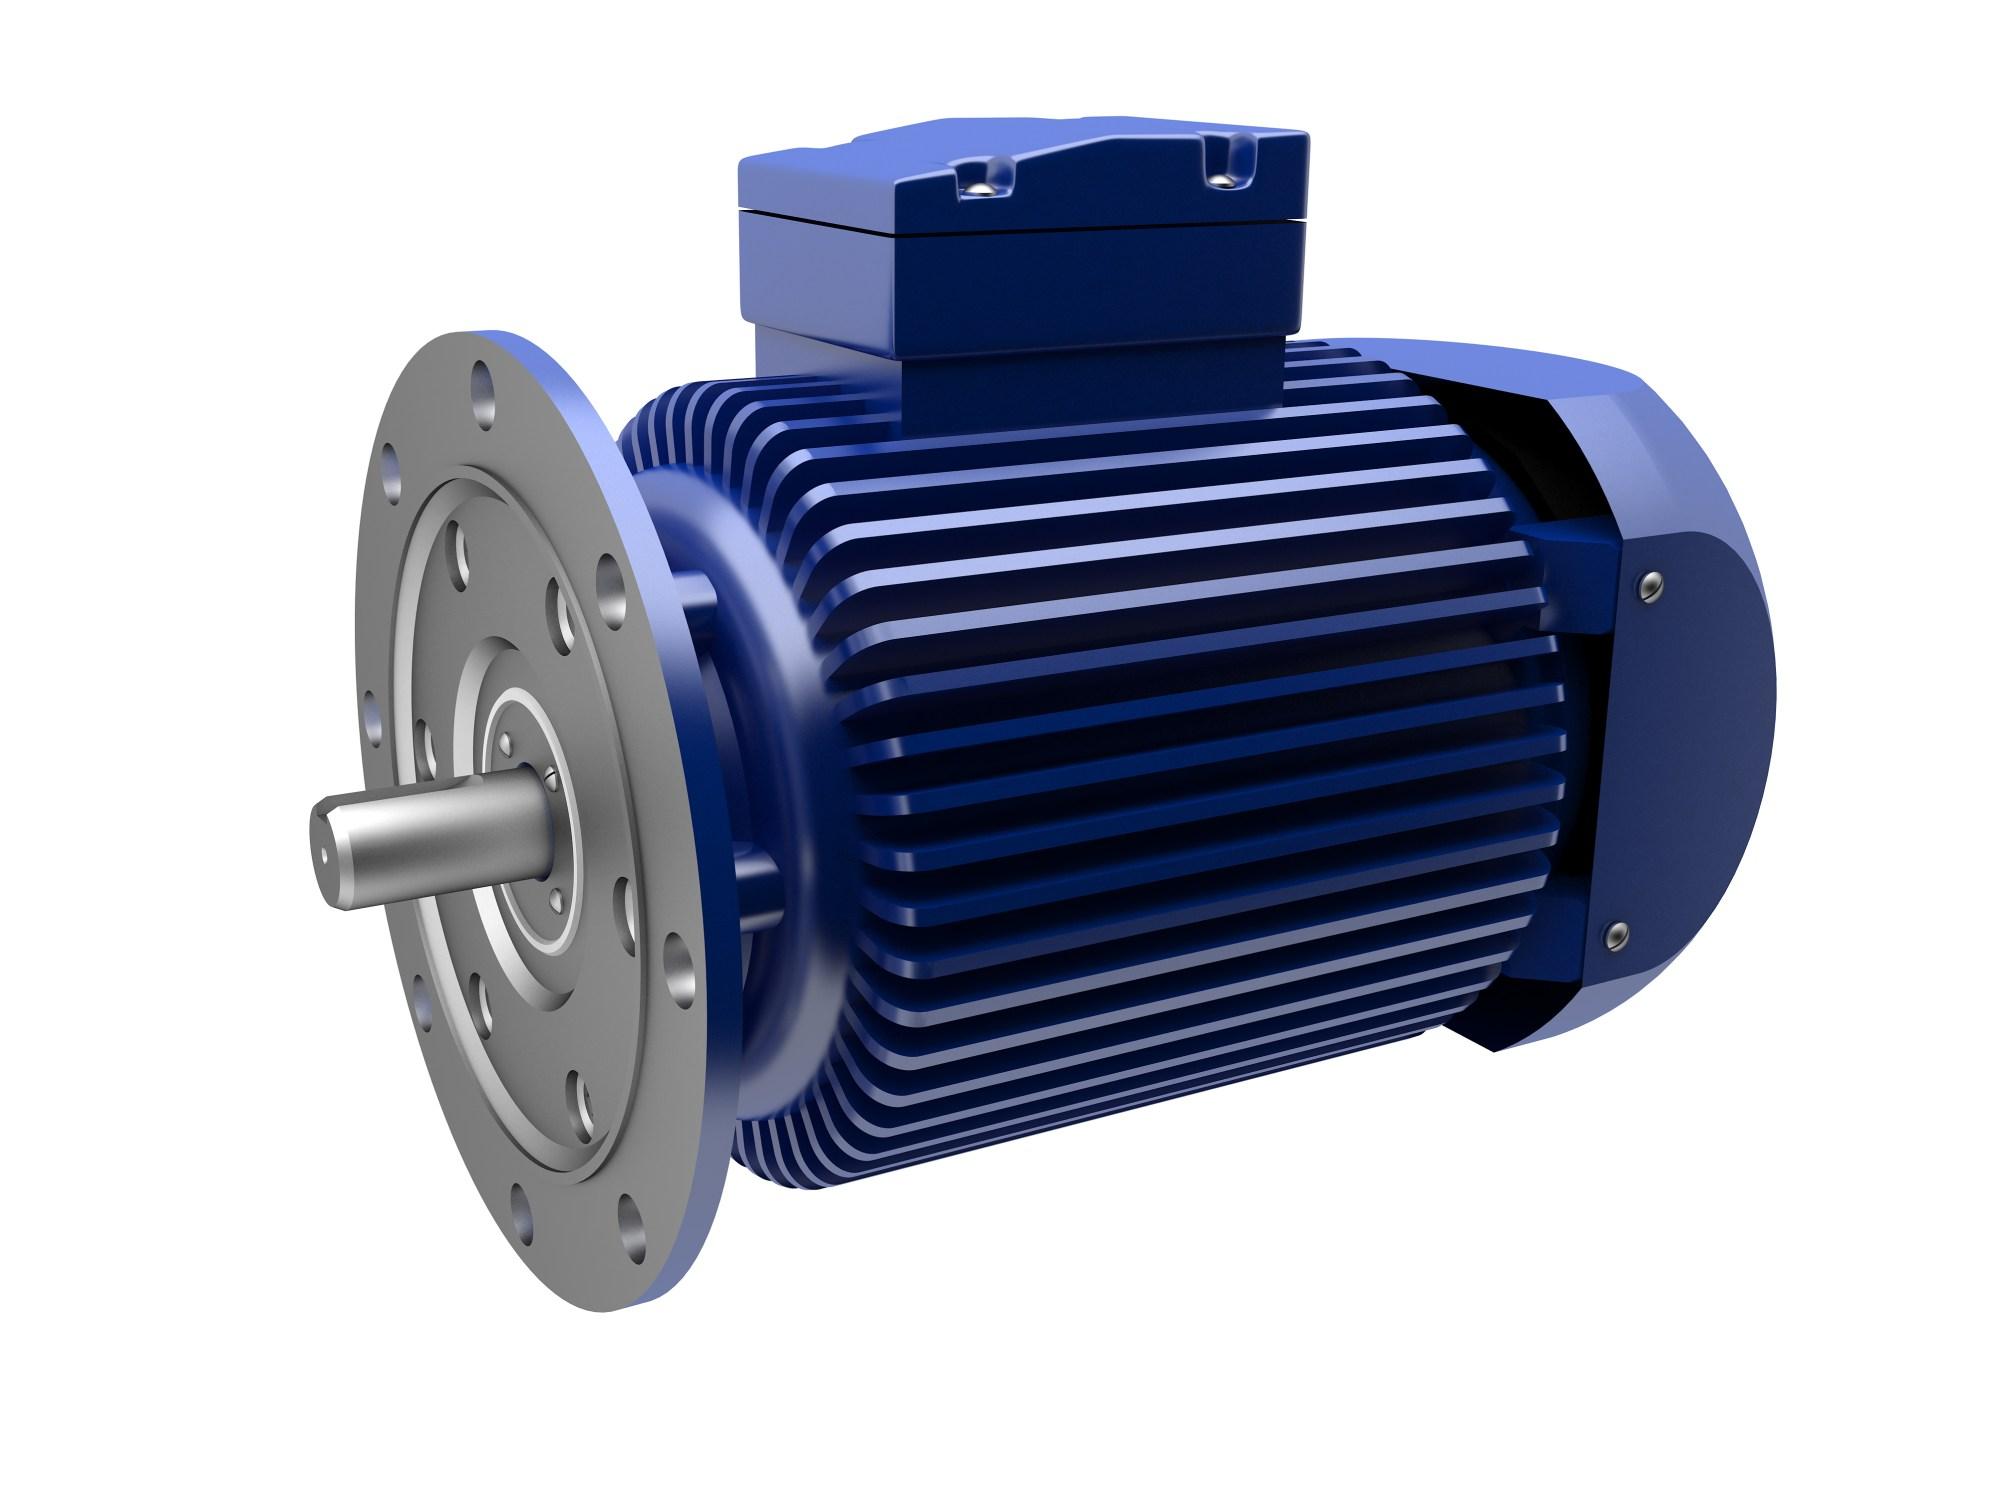 hight resolution of air compressor motor wiring diagram 110v or 220v